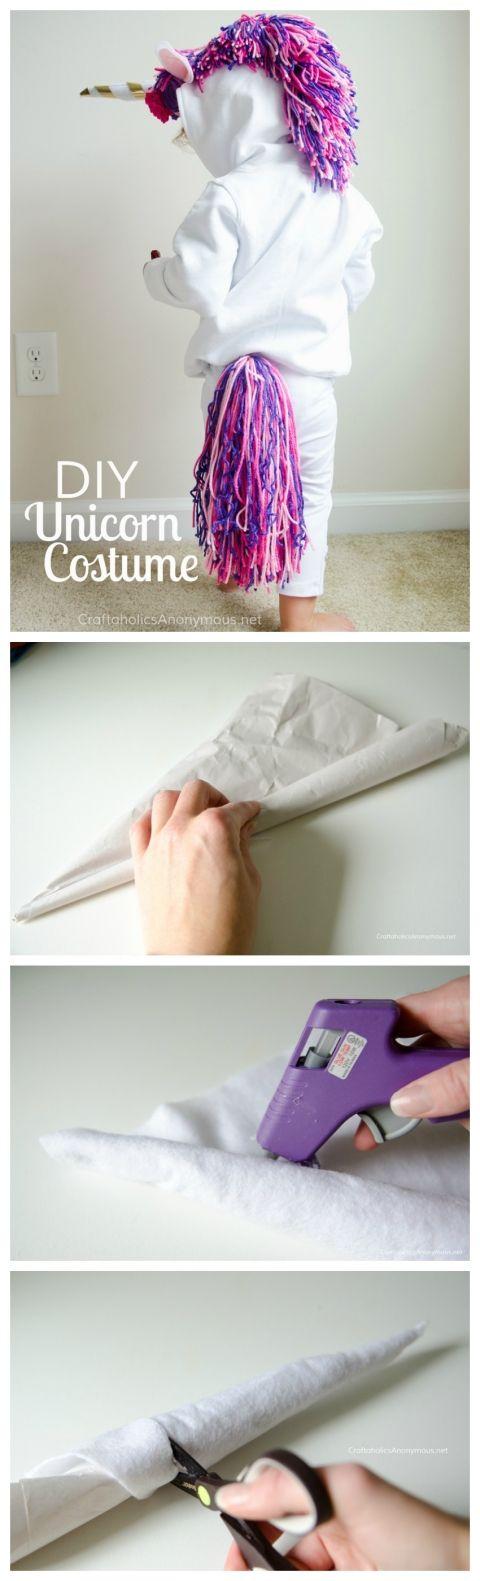 DIY Unicorn Halloween Costume Tutorial :: Super easy way to make a handmade unicorn horn